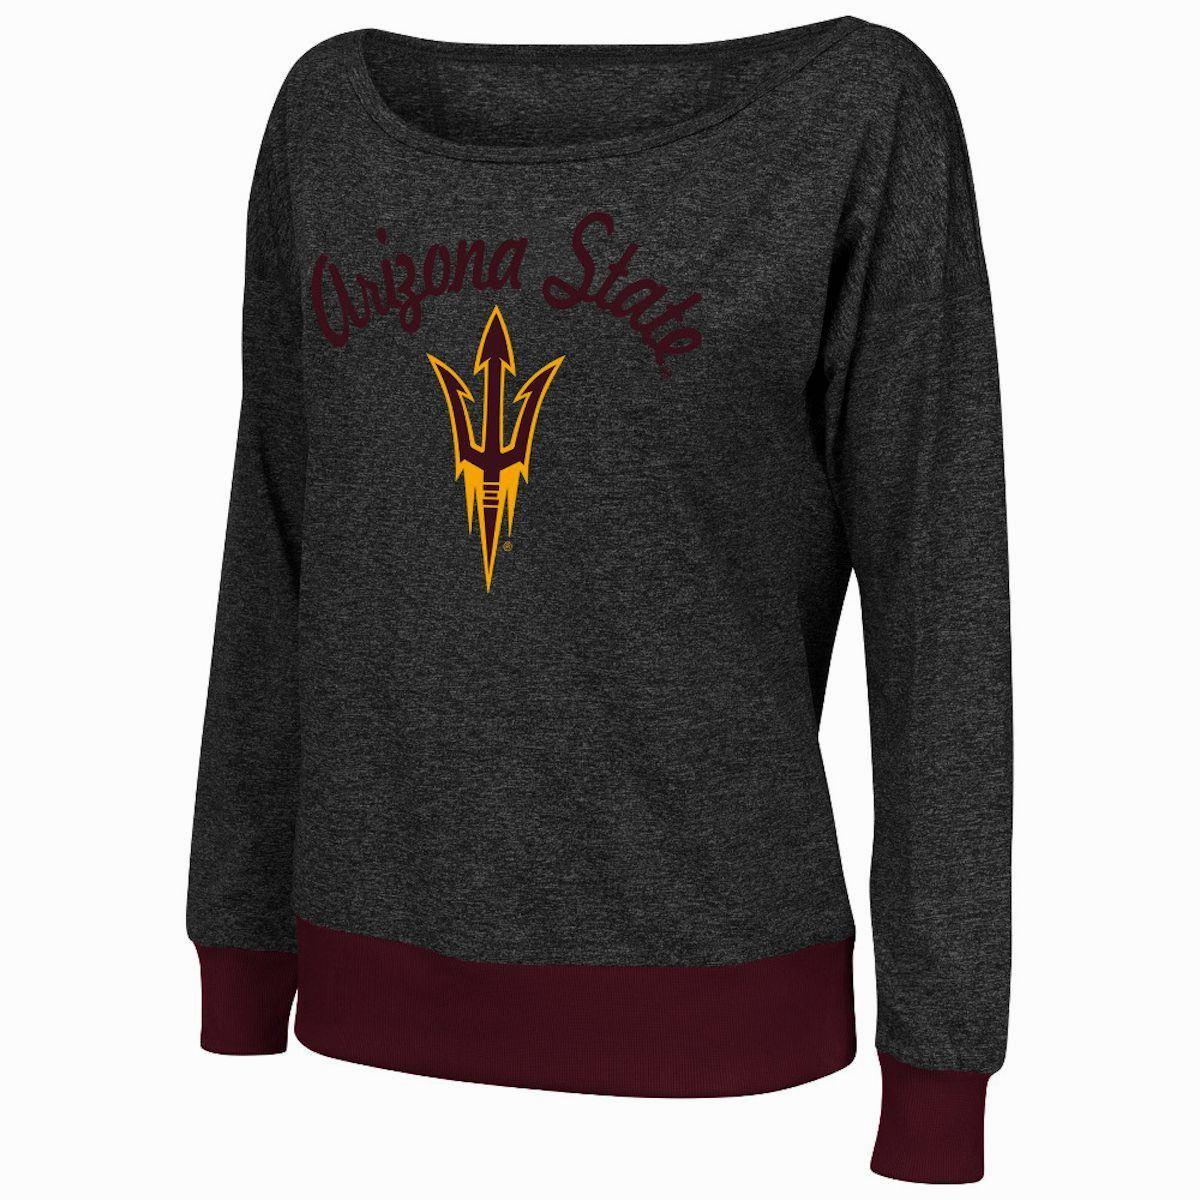 Arizona State Sun Devils Bikram Banded Bottom Charcoal Womens Tee Shirt